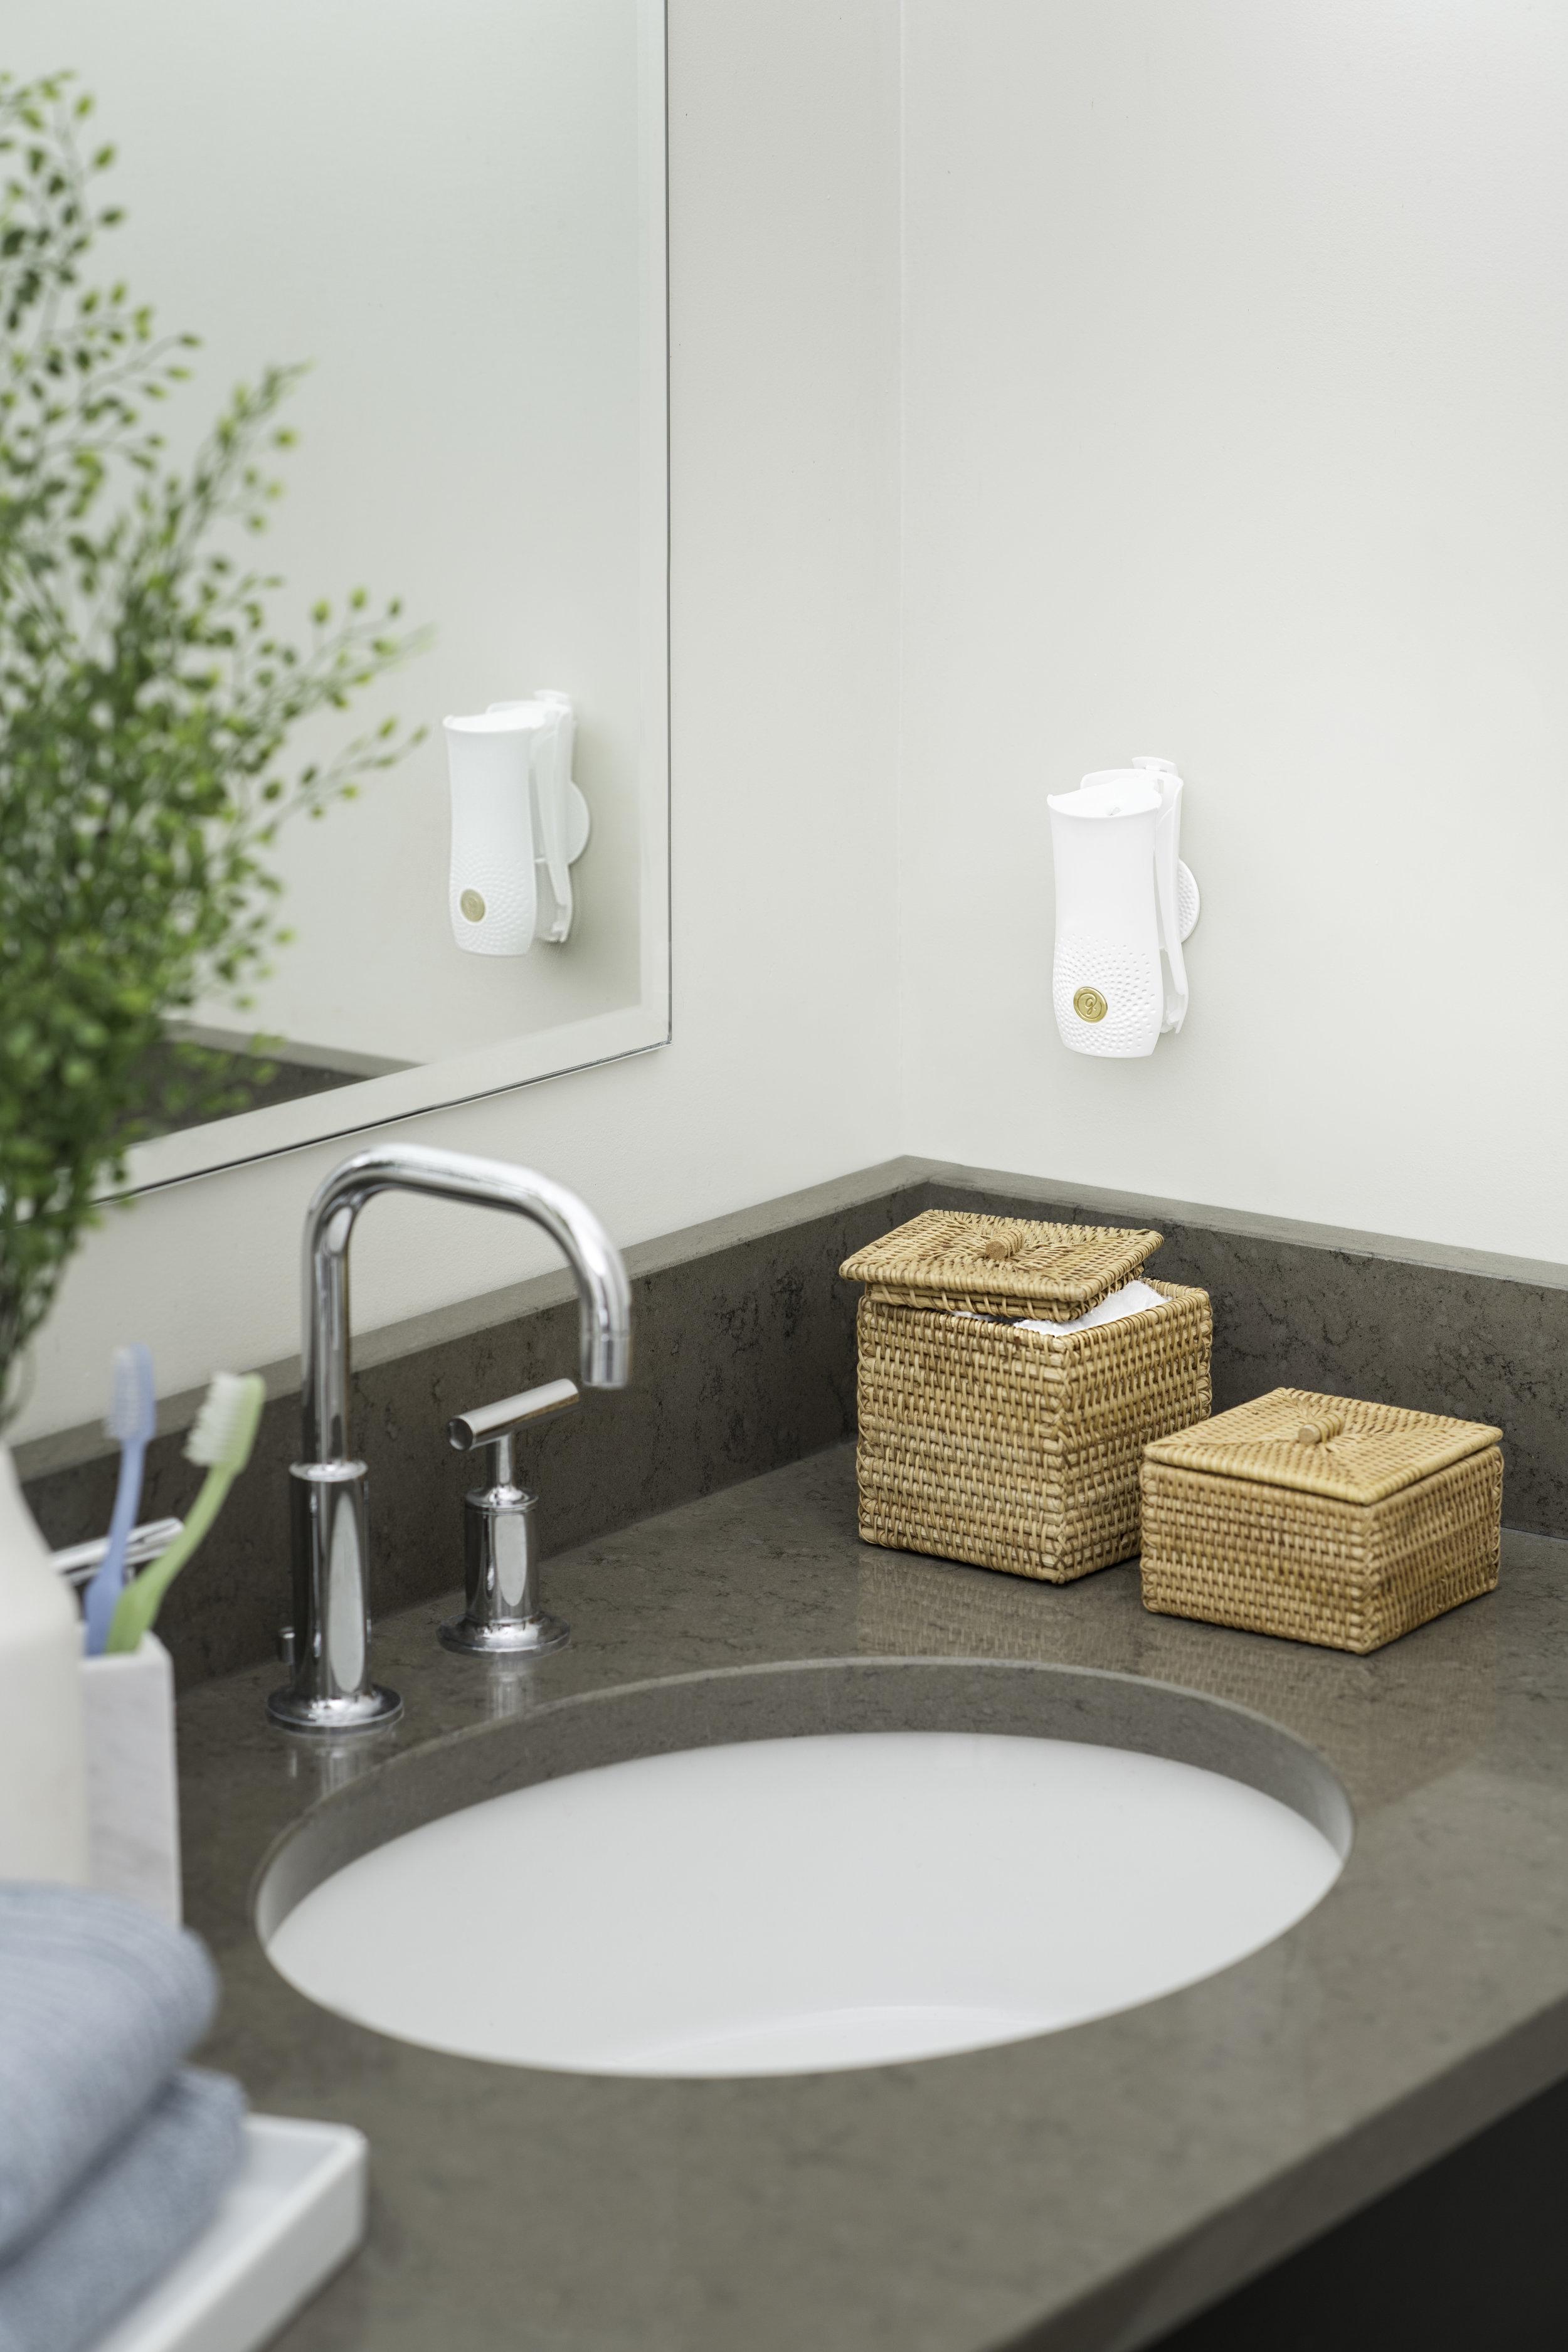 SCJ_SCJGL_17062 _Bathroom2_Sink_MiniSprayCocoon_Angle_Hero_2285-3.jpg